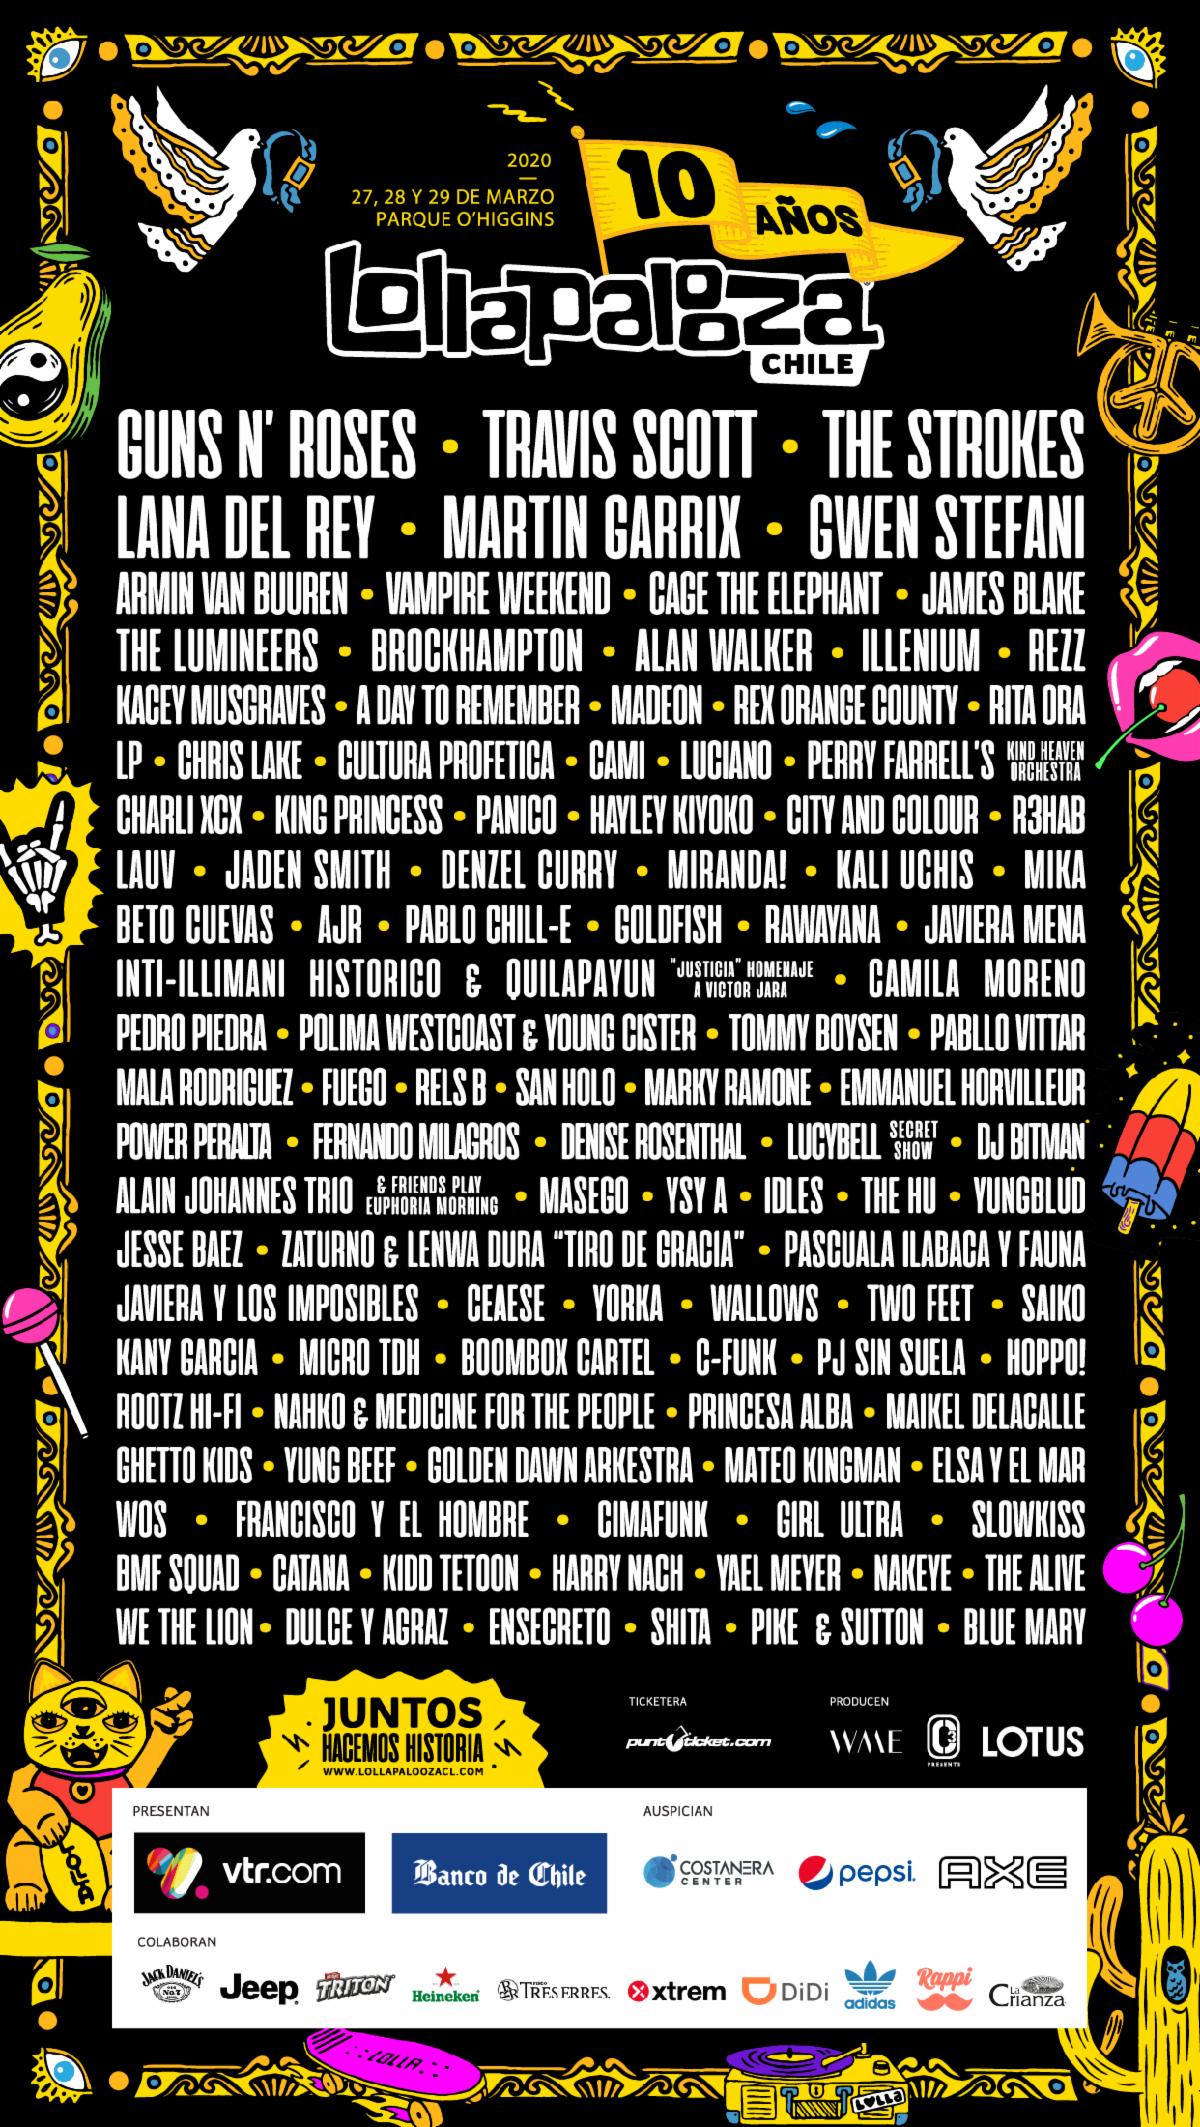 Lollapalooza Brasil 2020 lineup